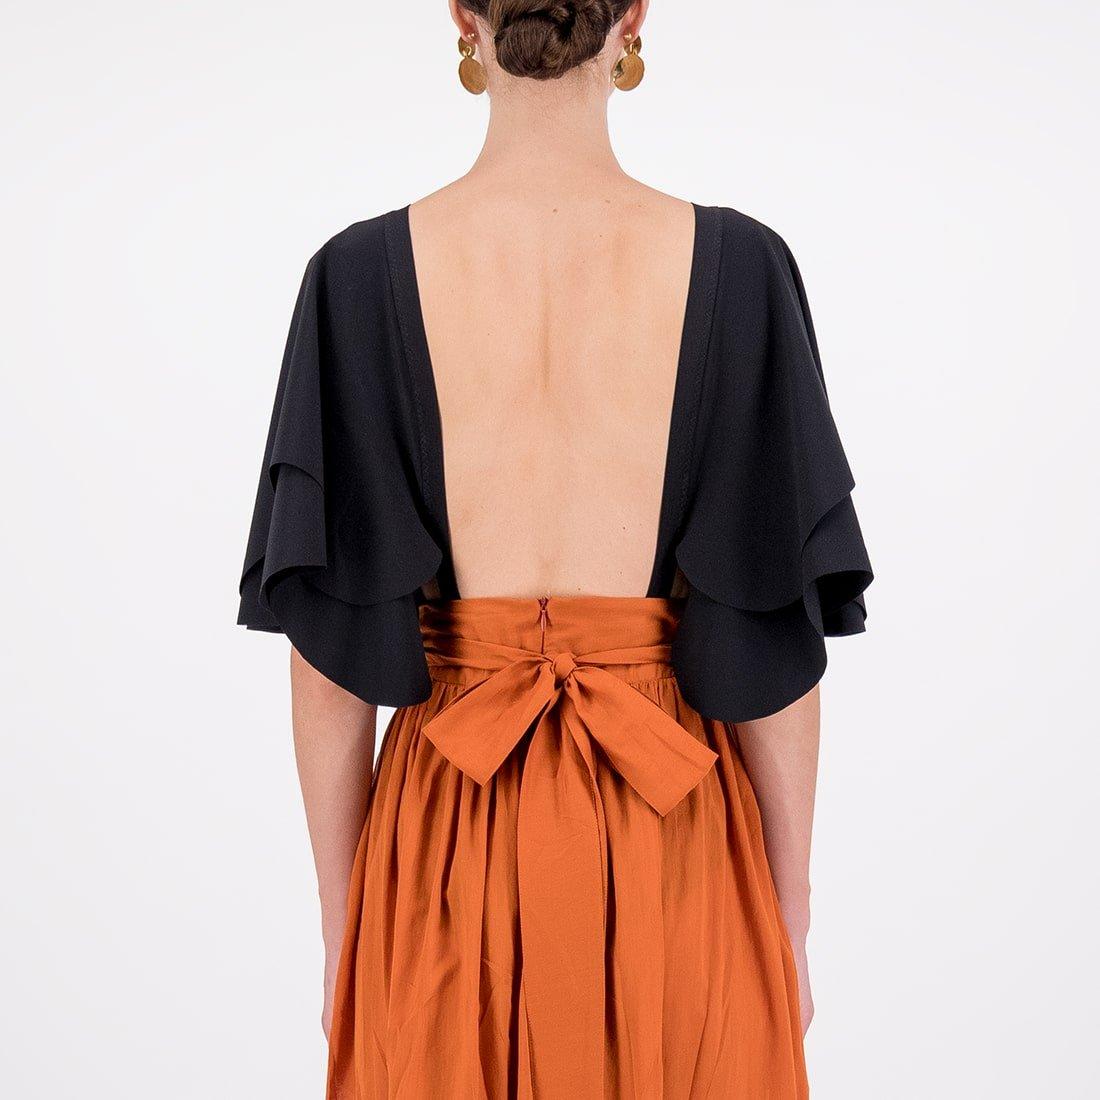 Mariposa Bodysuit 3